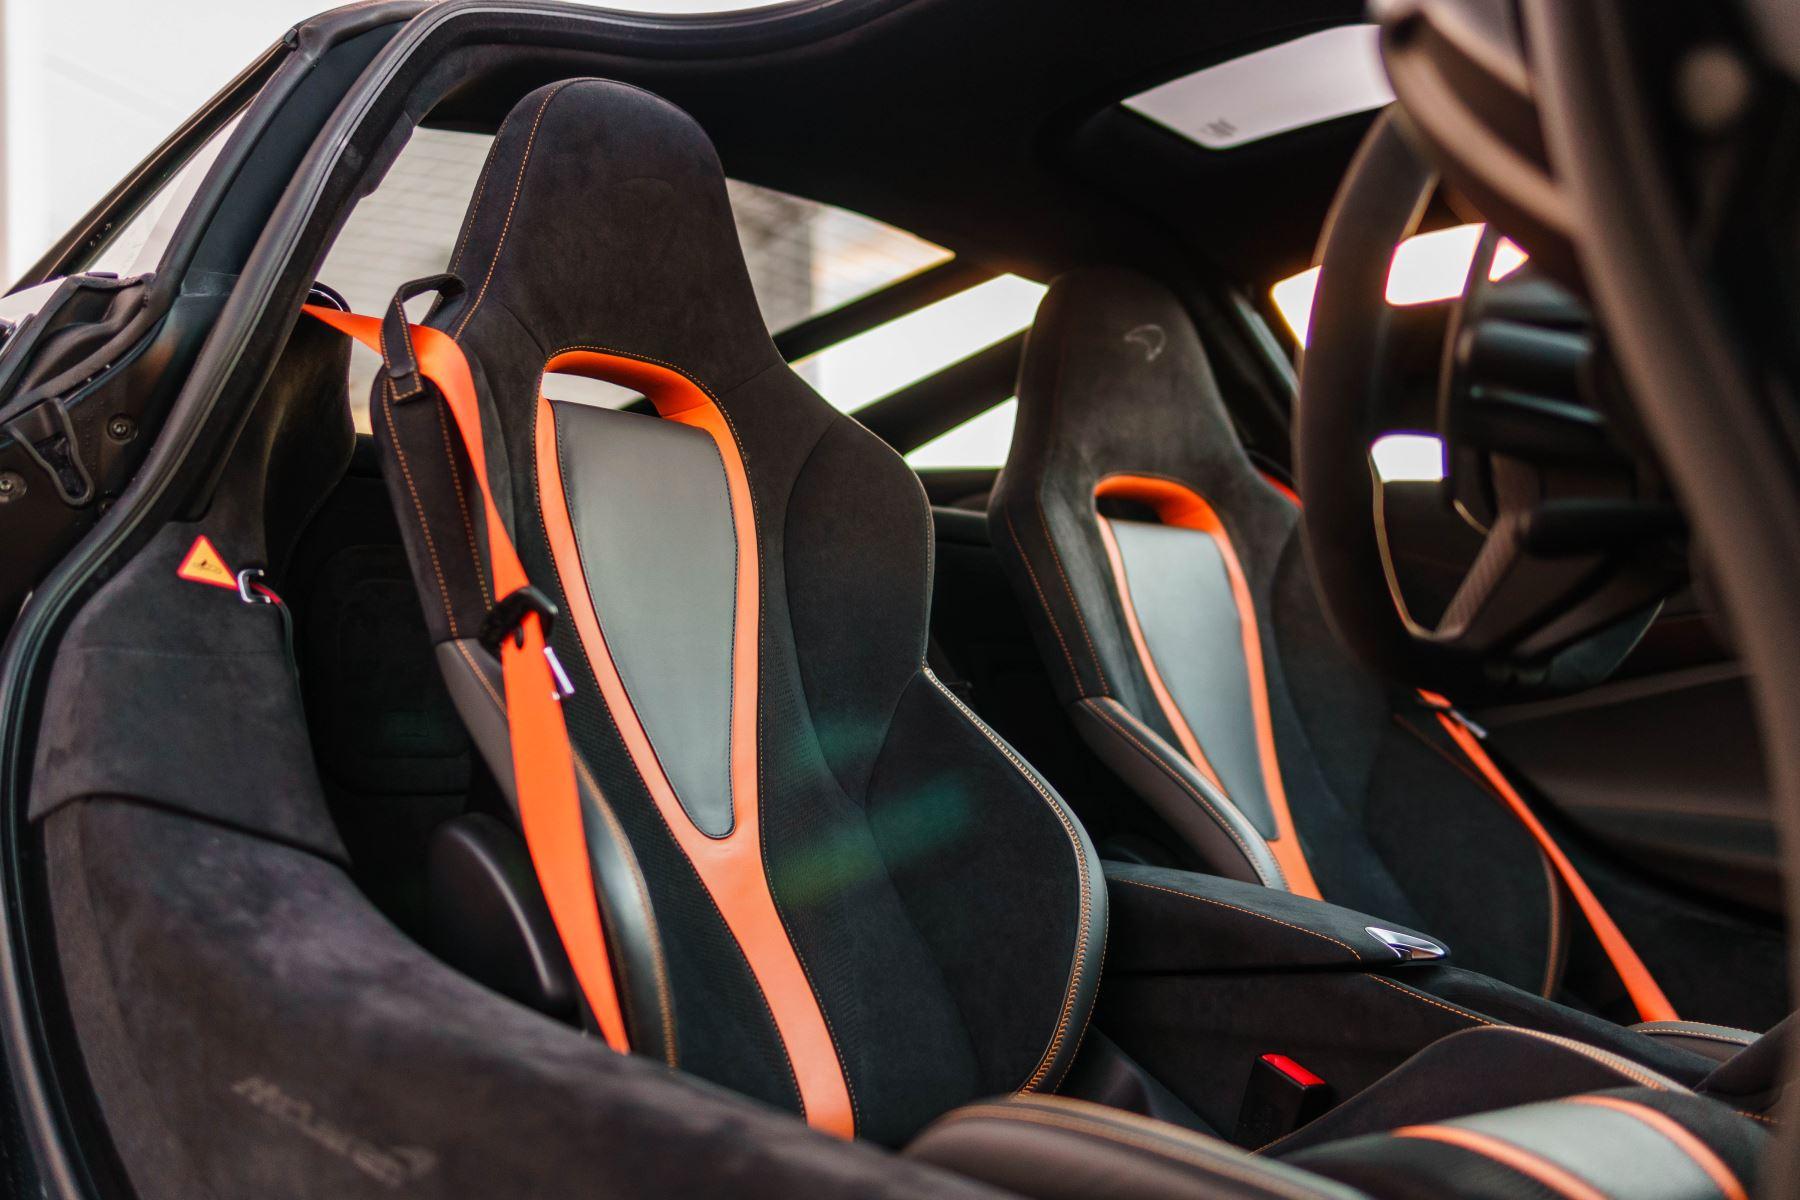 McLaren 720S Performance Coupe  image 61